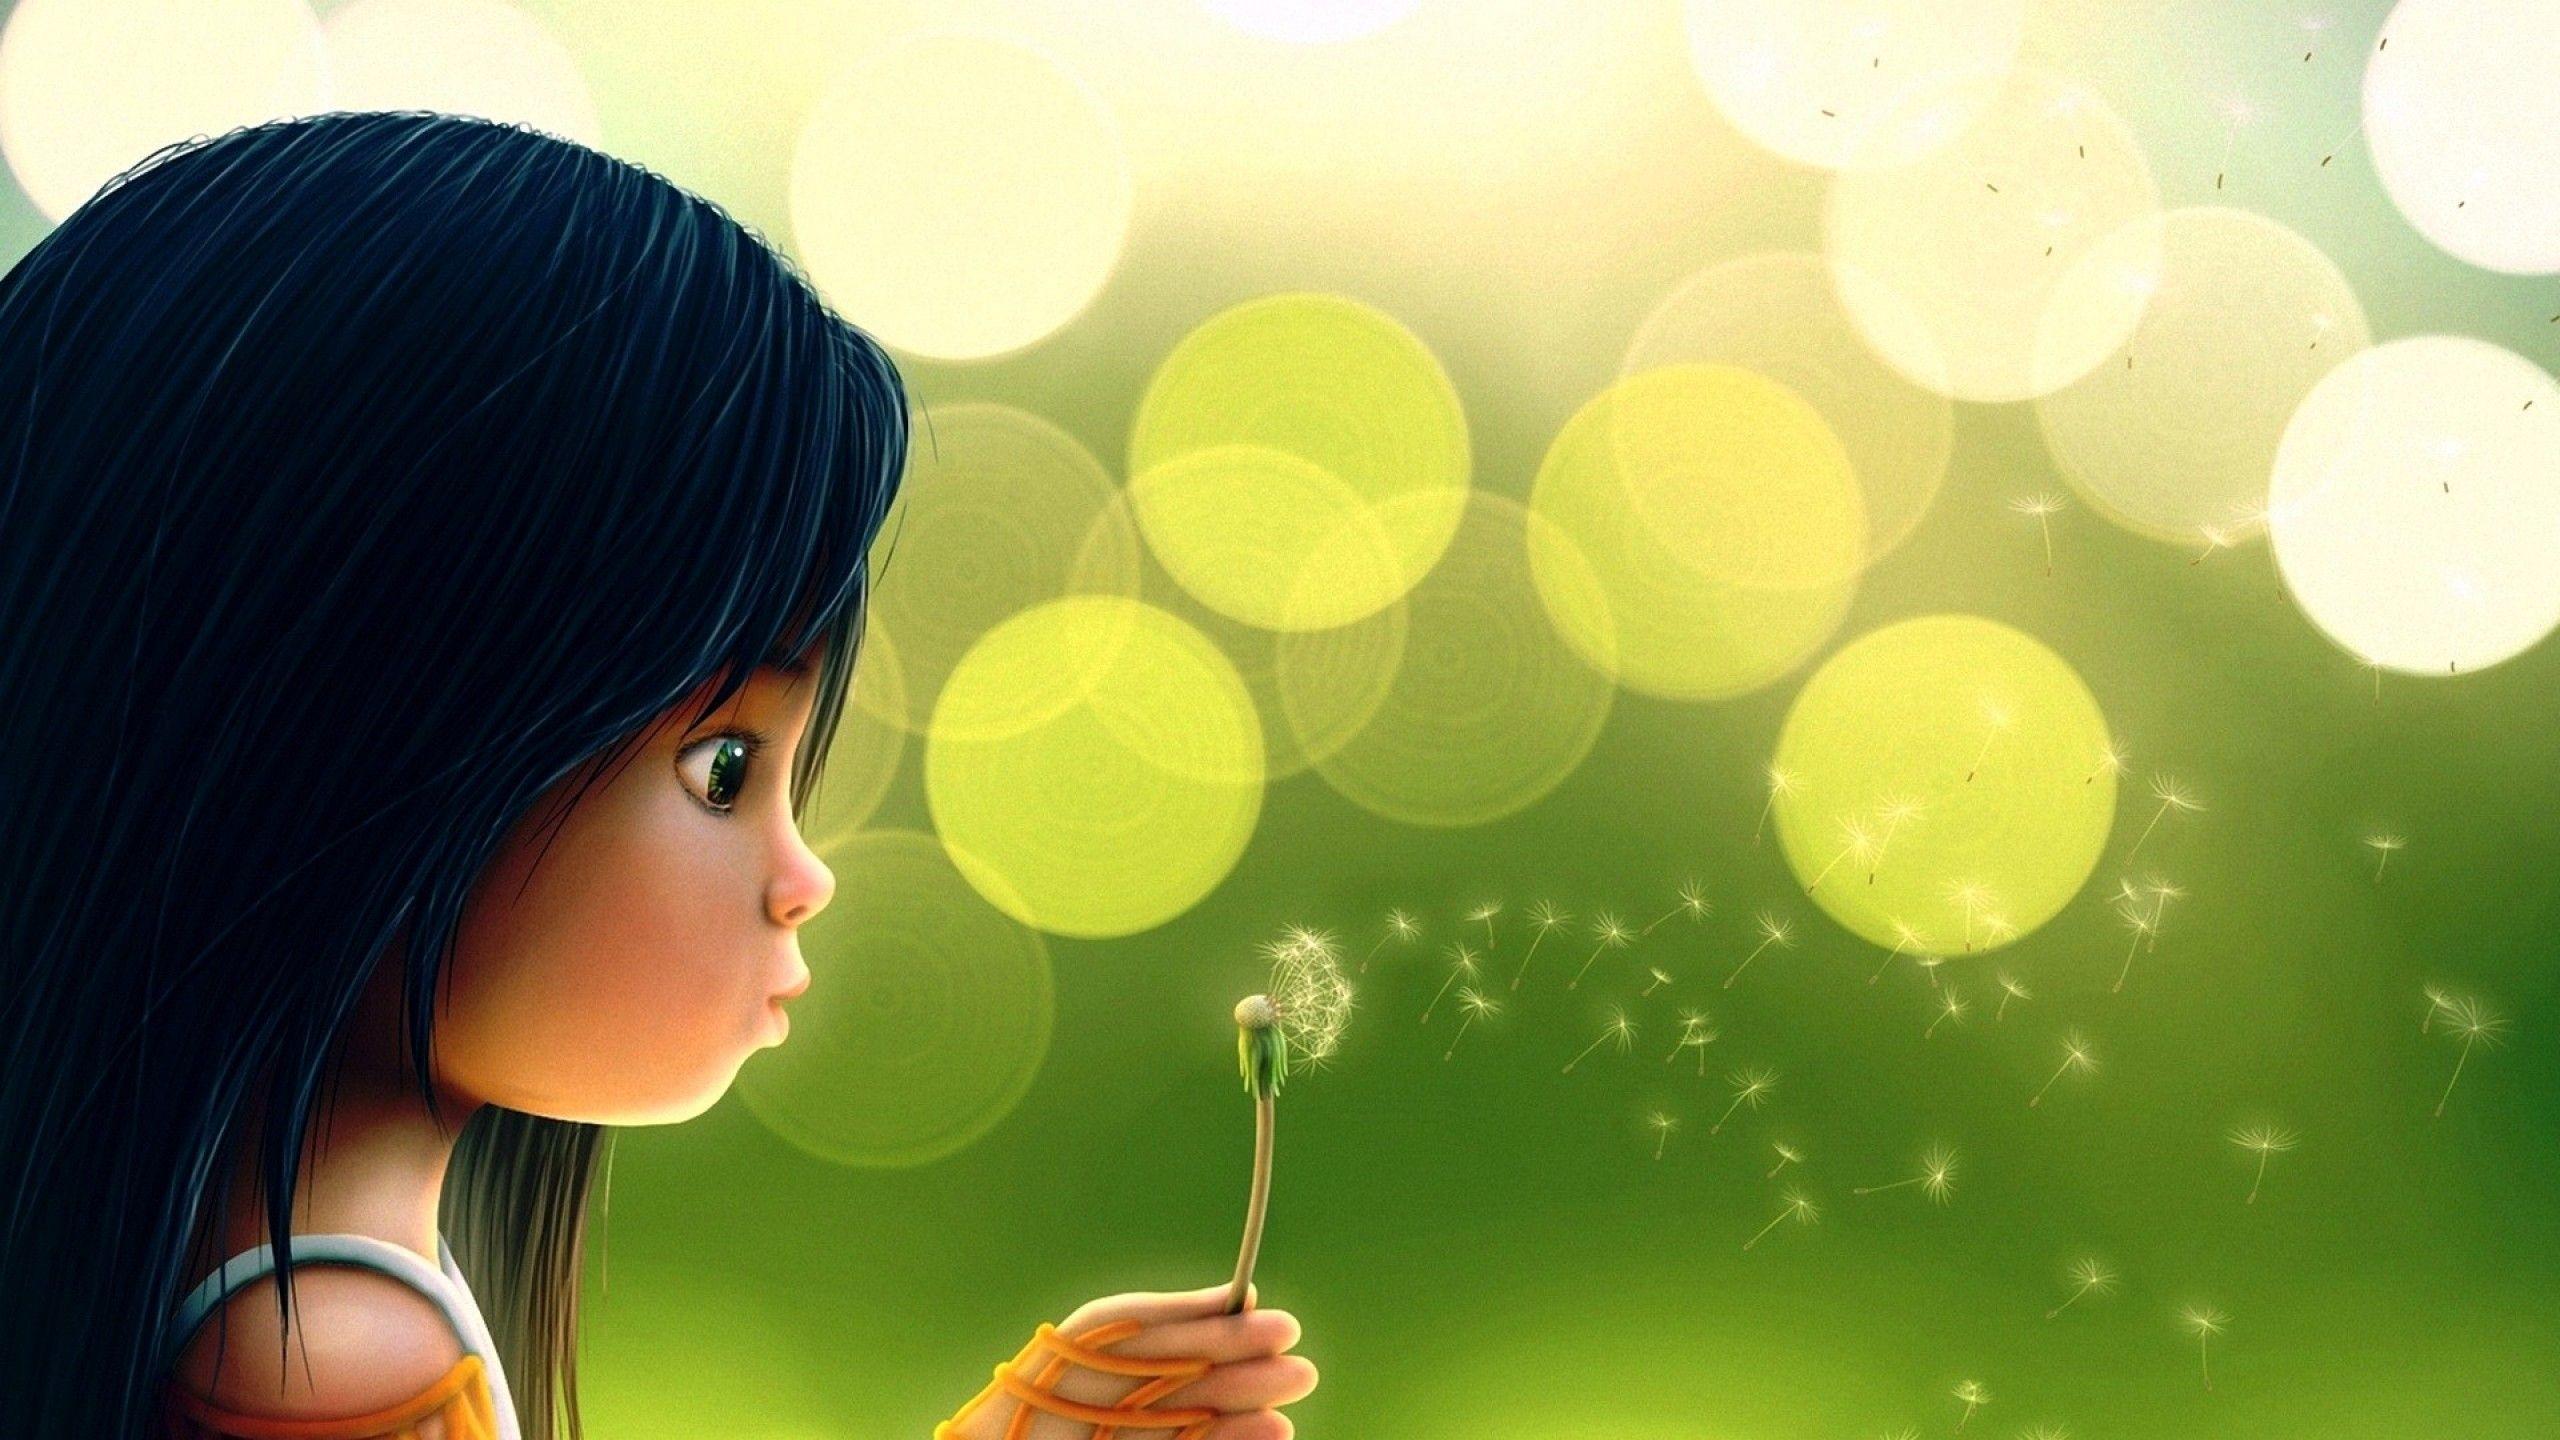 Res: 2560x1440, Download Cute cartoon girl blowing dandelion High quality wallpaper